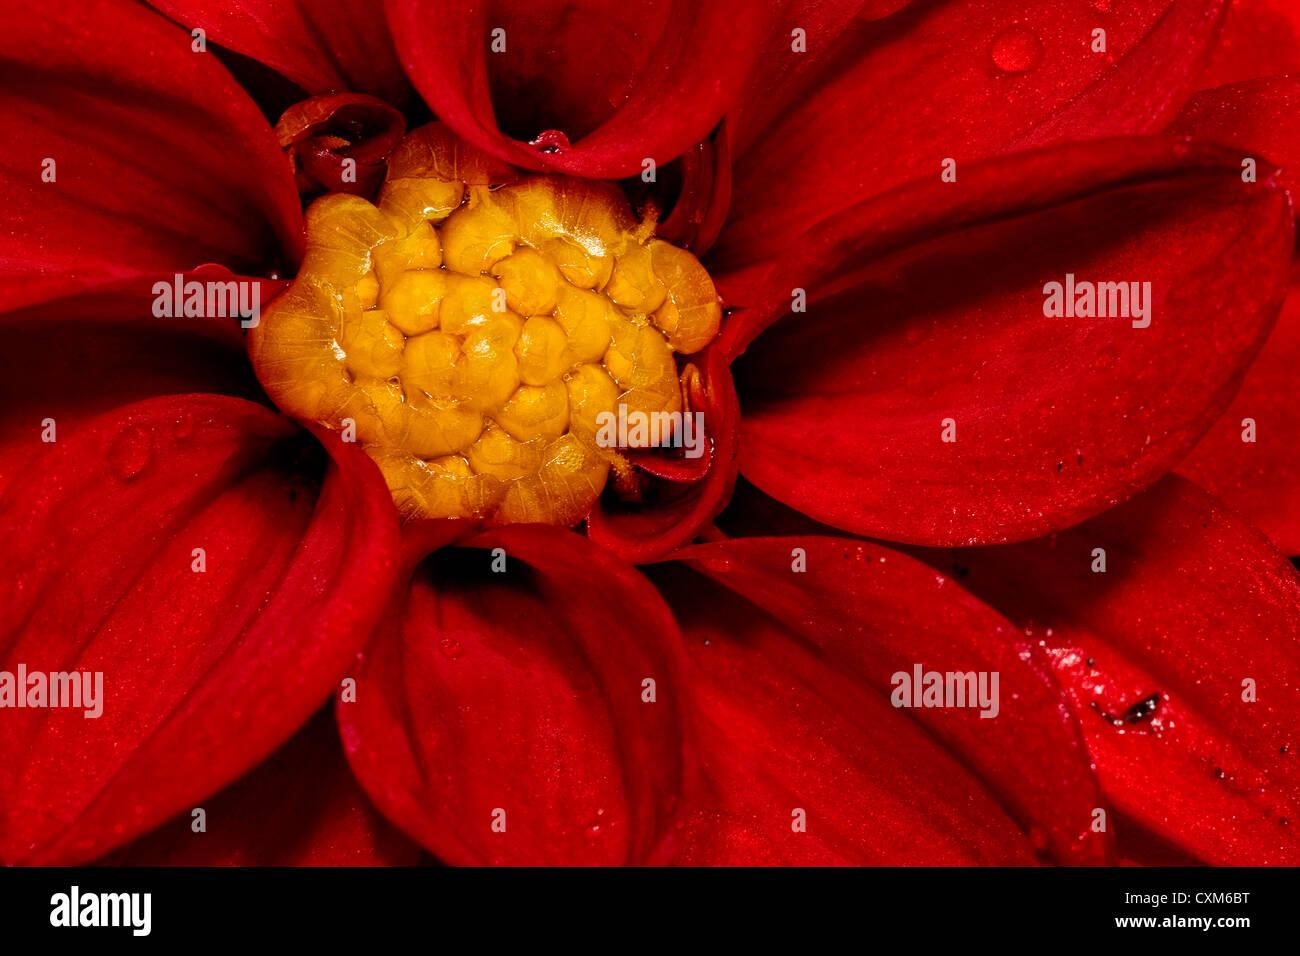 Close-up of a Red Dahlia - Stock Image